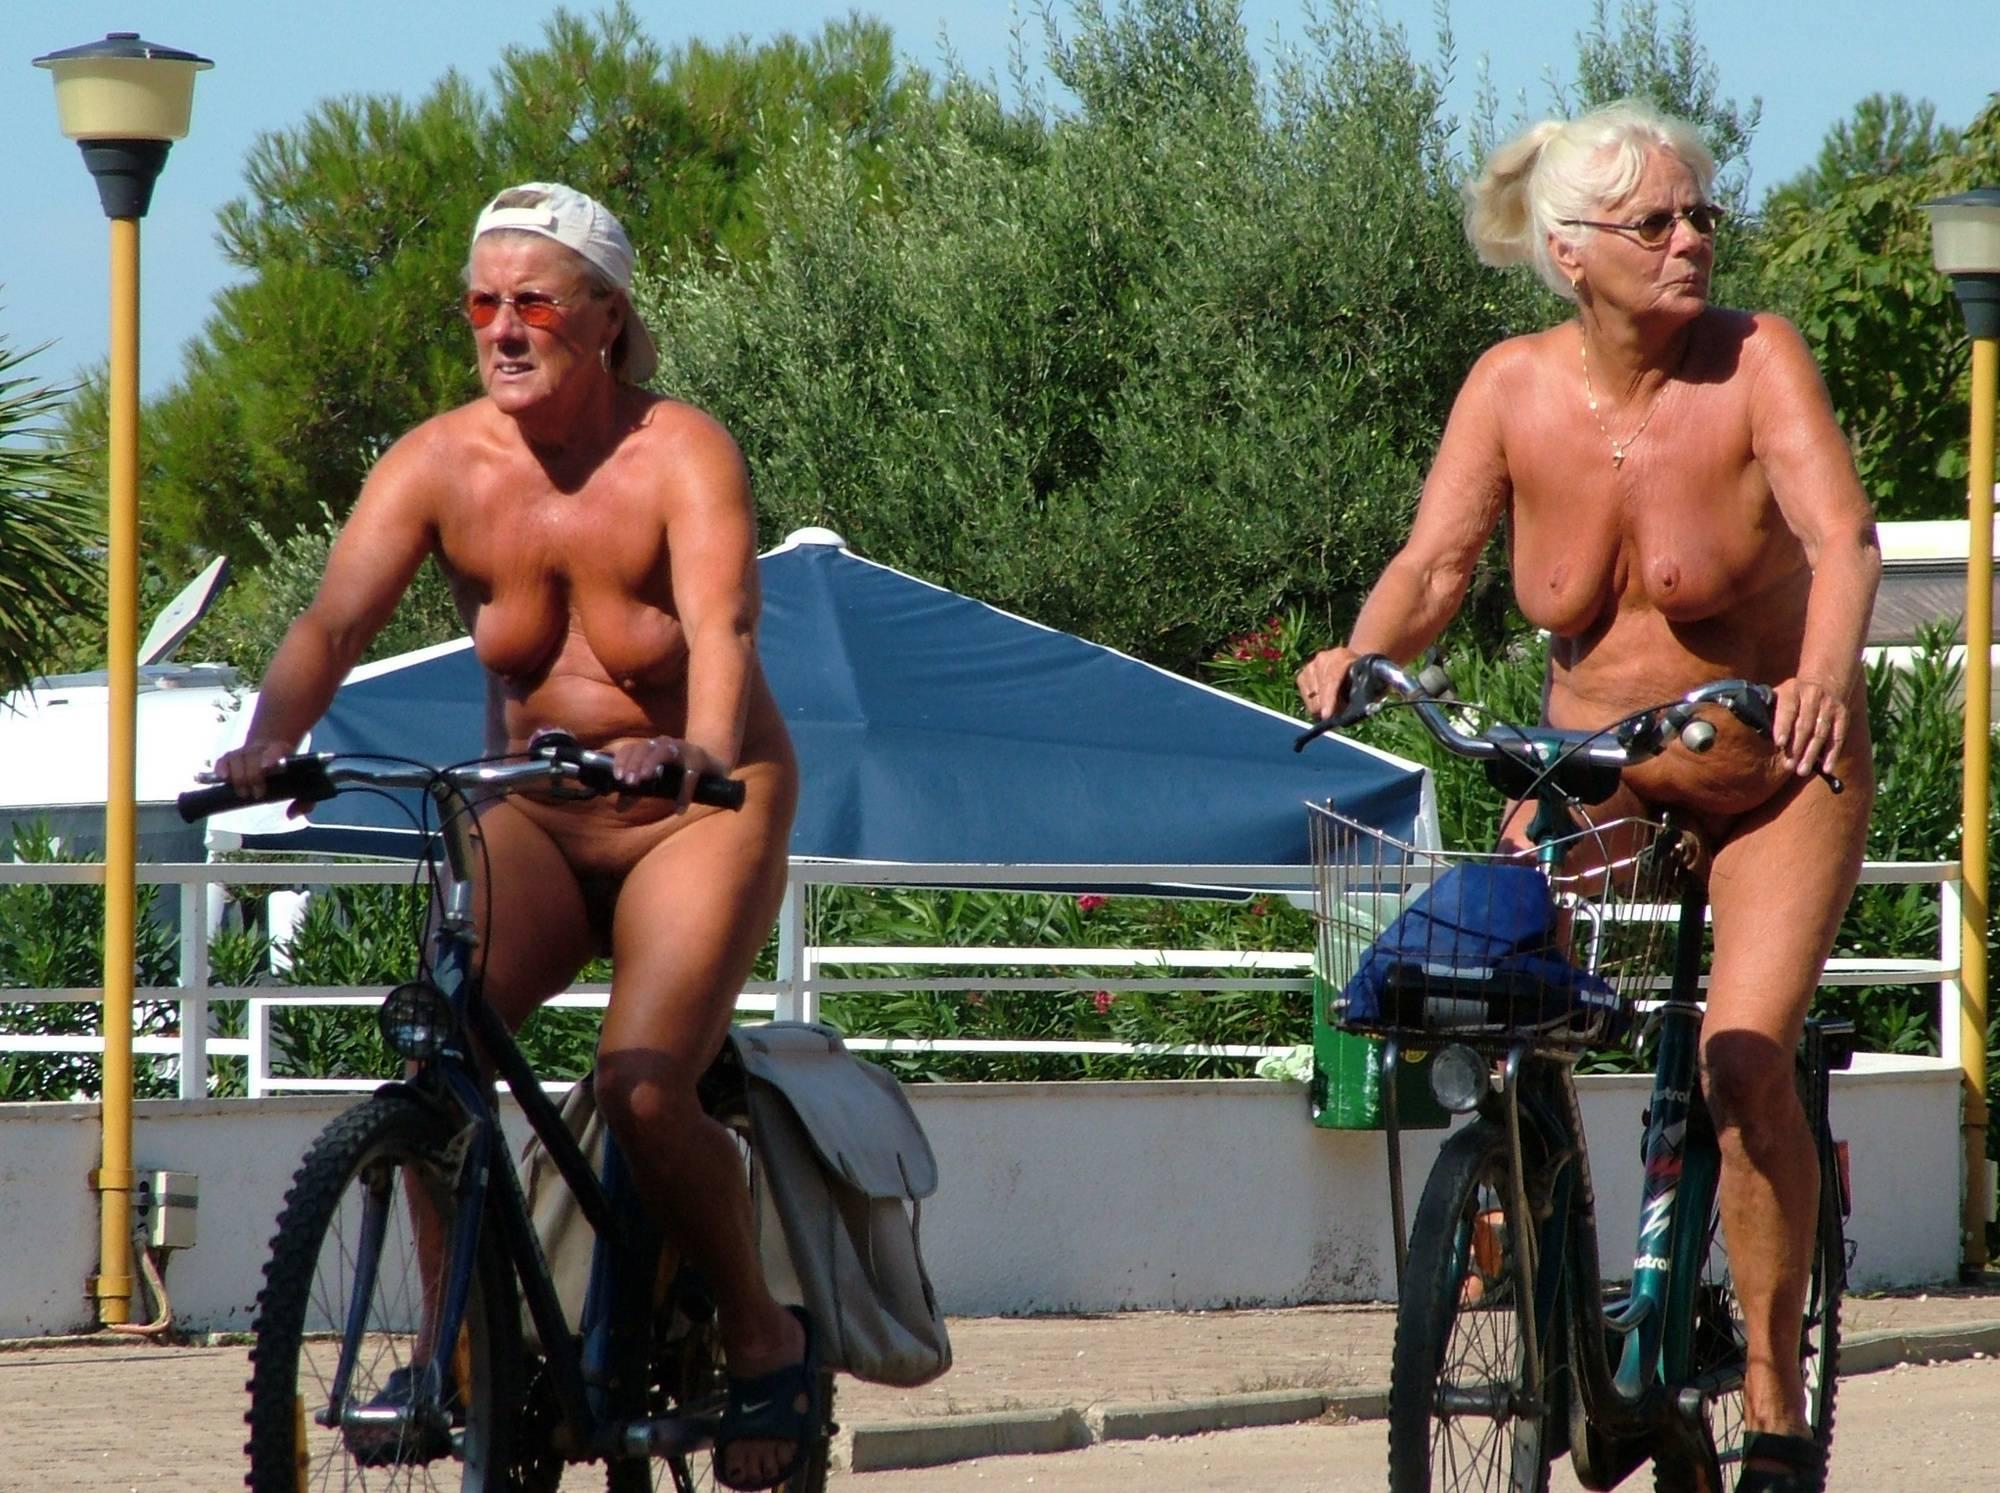 Purenudism Pics Naturist FKK Day Biking - 2